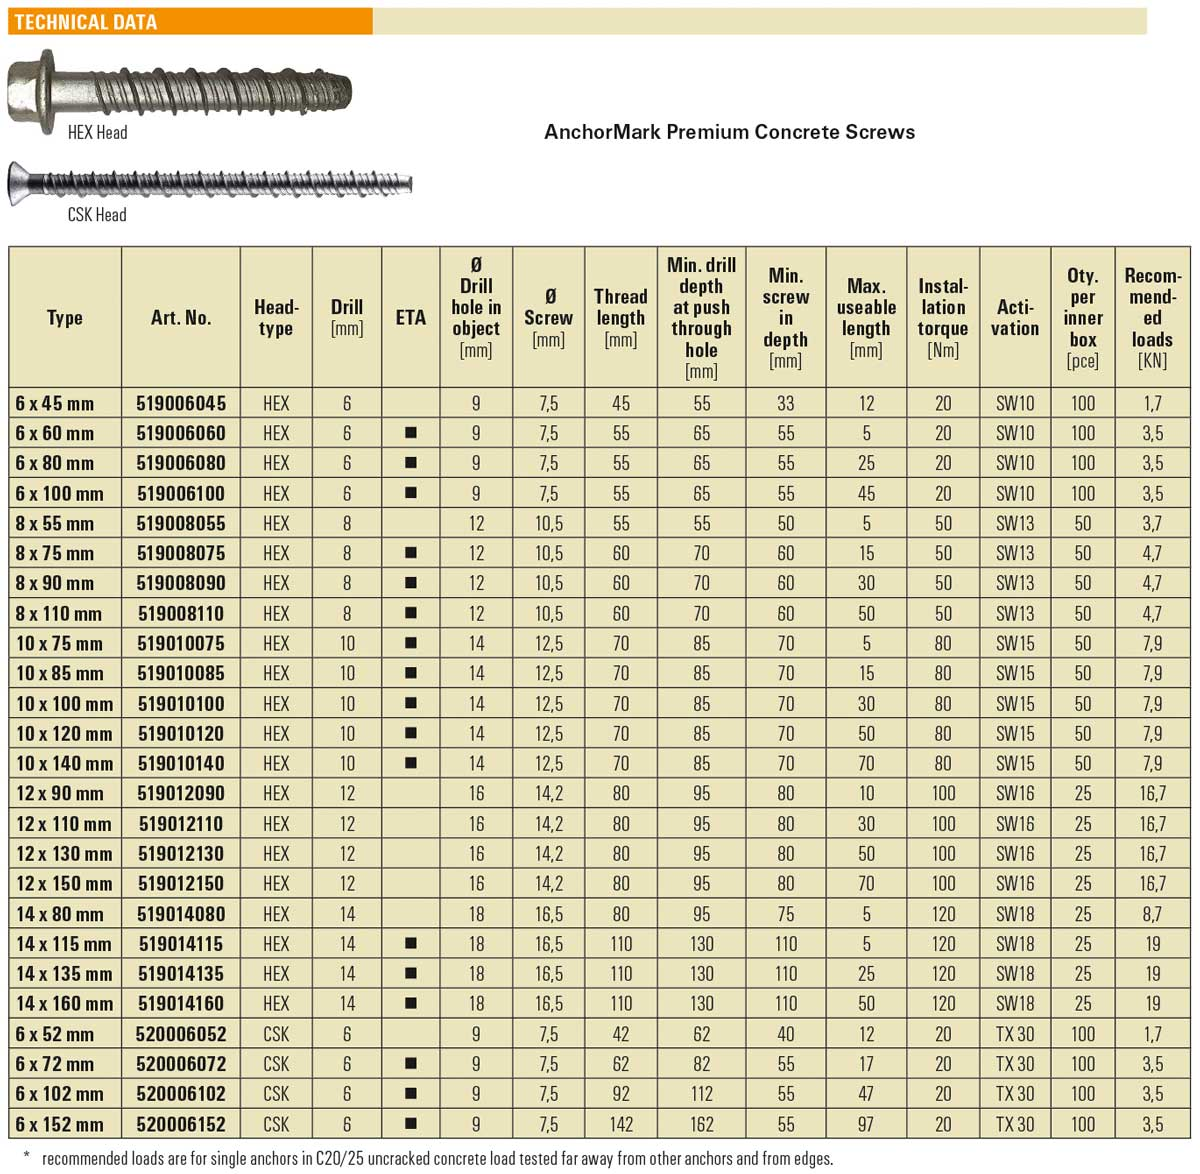 Premium Concrete Screws with Rusper® Coating from Anchormark